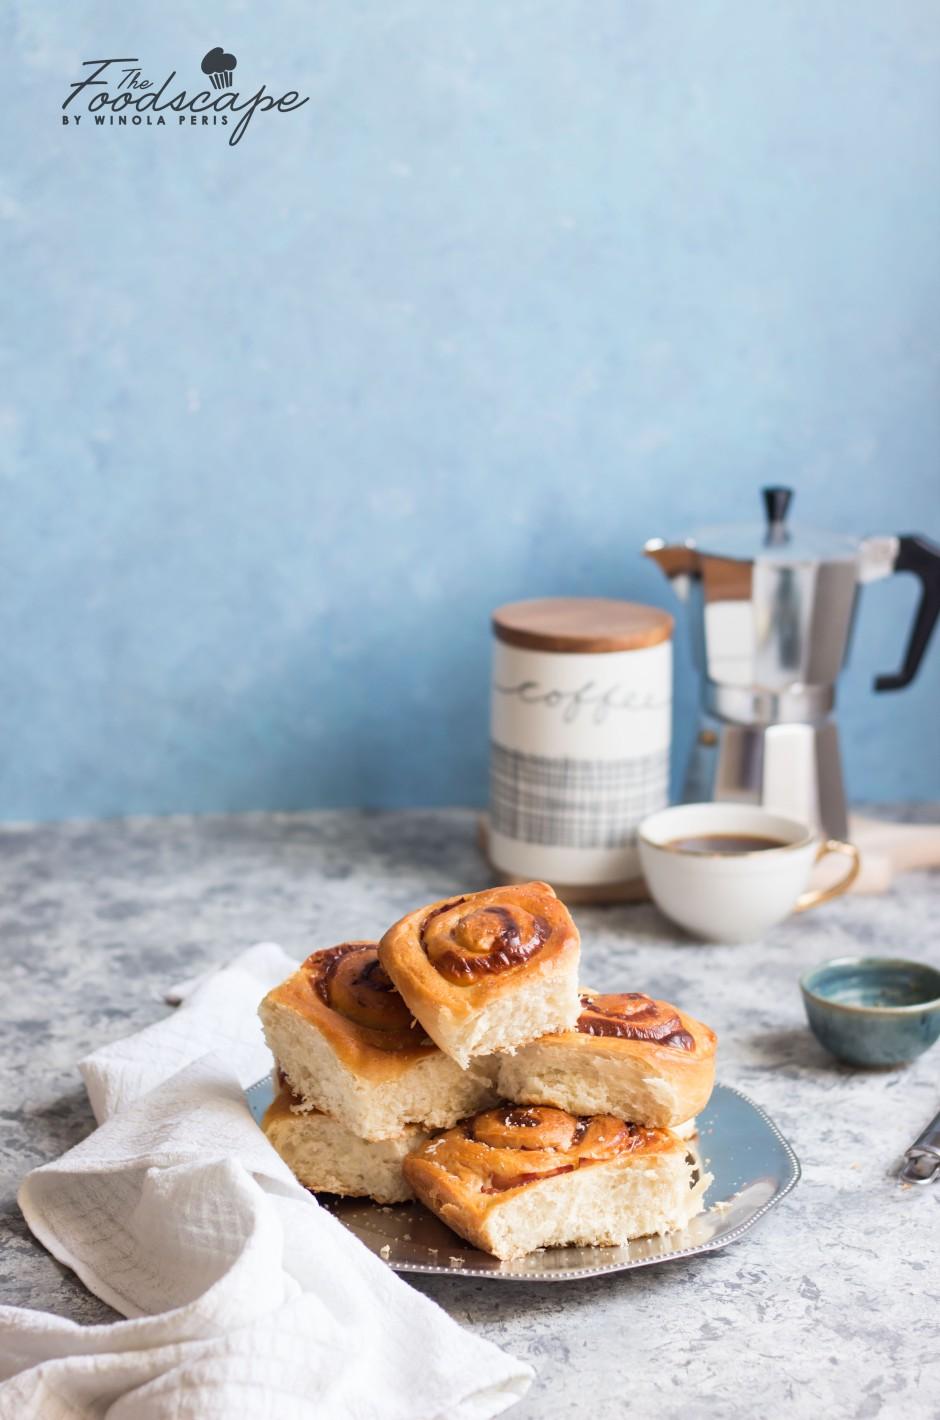 Turkey & Cheese Rolls, Easy Bread Rolls, Easy Dinner Rolls, Cinnamon Rolls, Turkey Rolls, Cheesy Bread, Bread Recipes. Homemade Dinner Rolls Recipe. #food #recipe #foodphotography